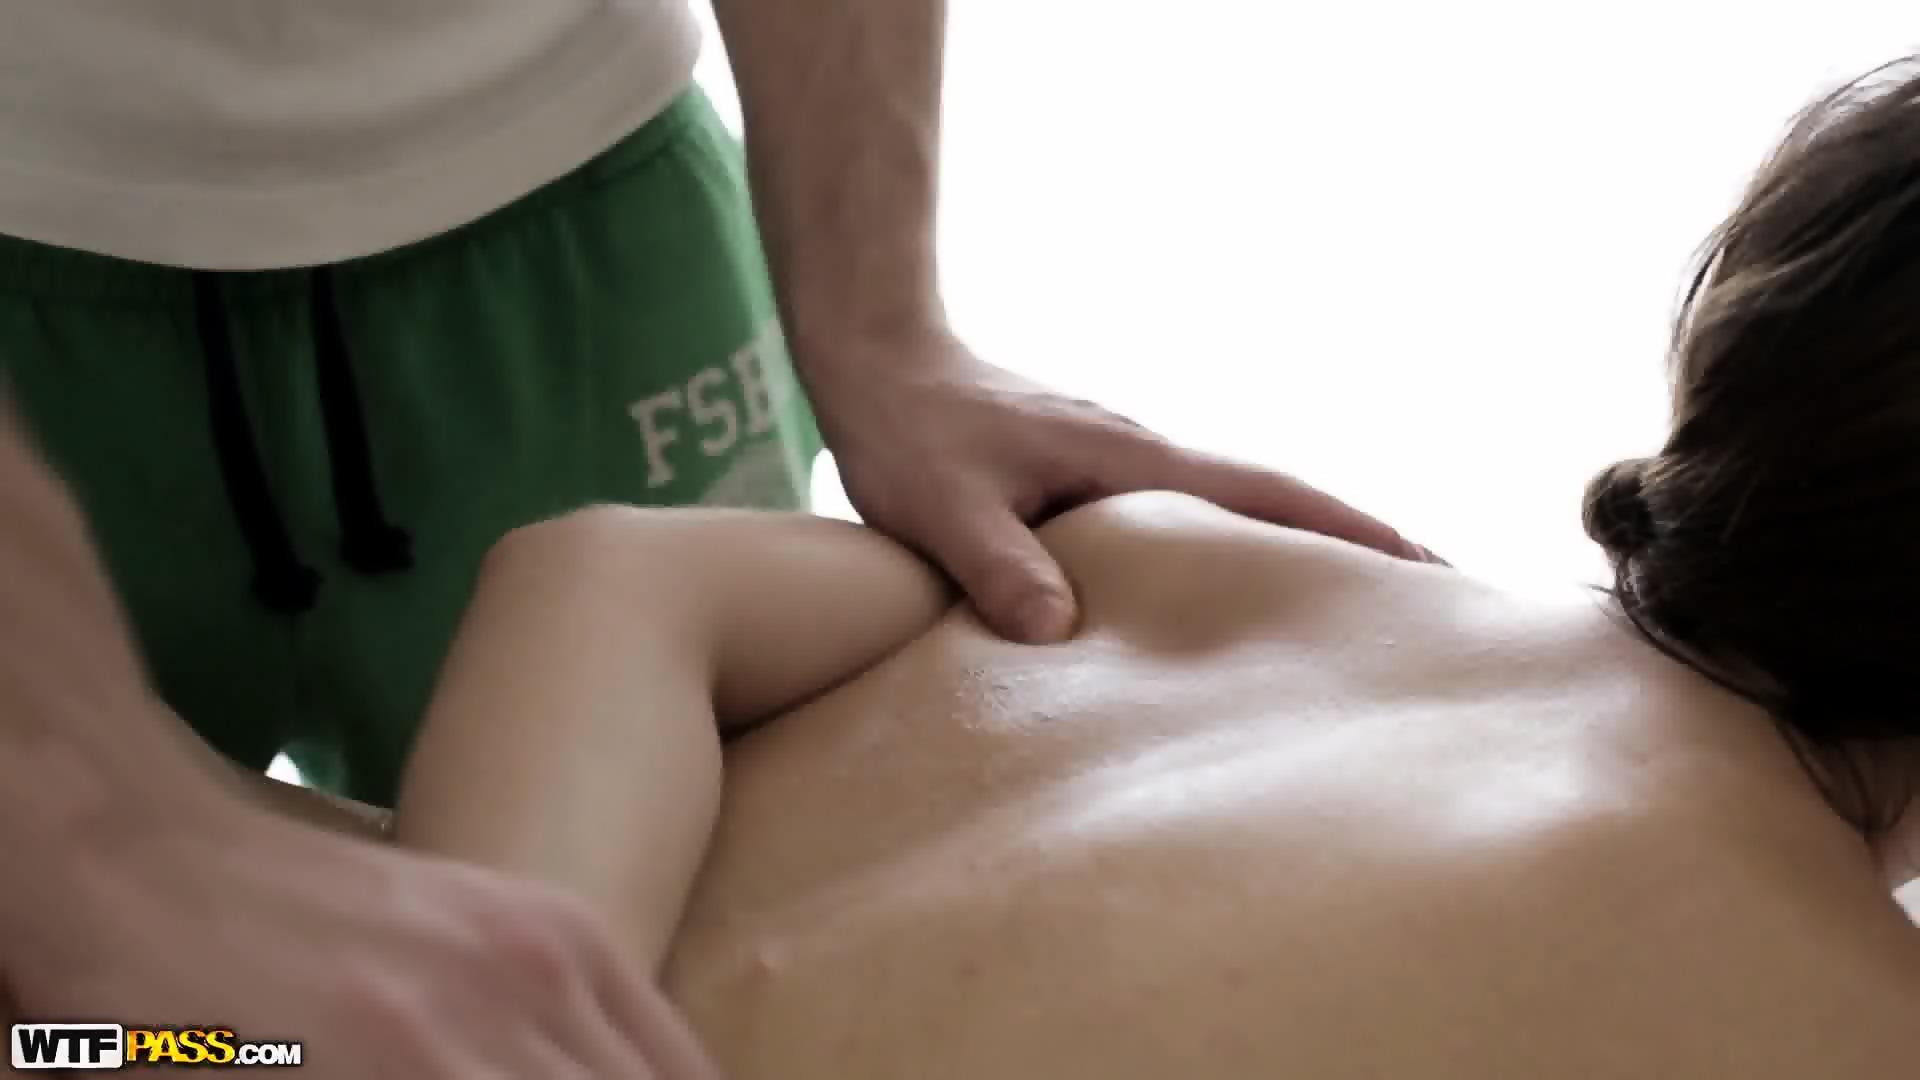 massage fyn porn historier